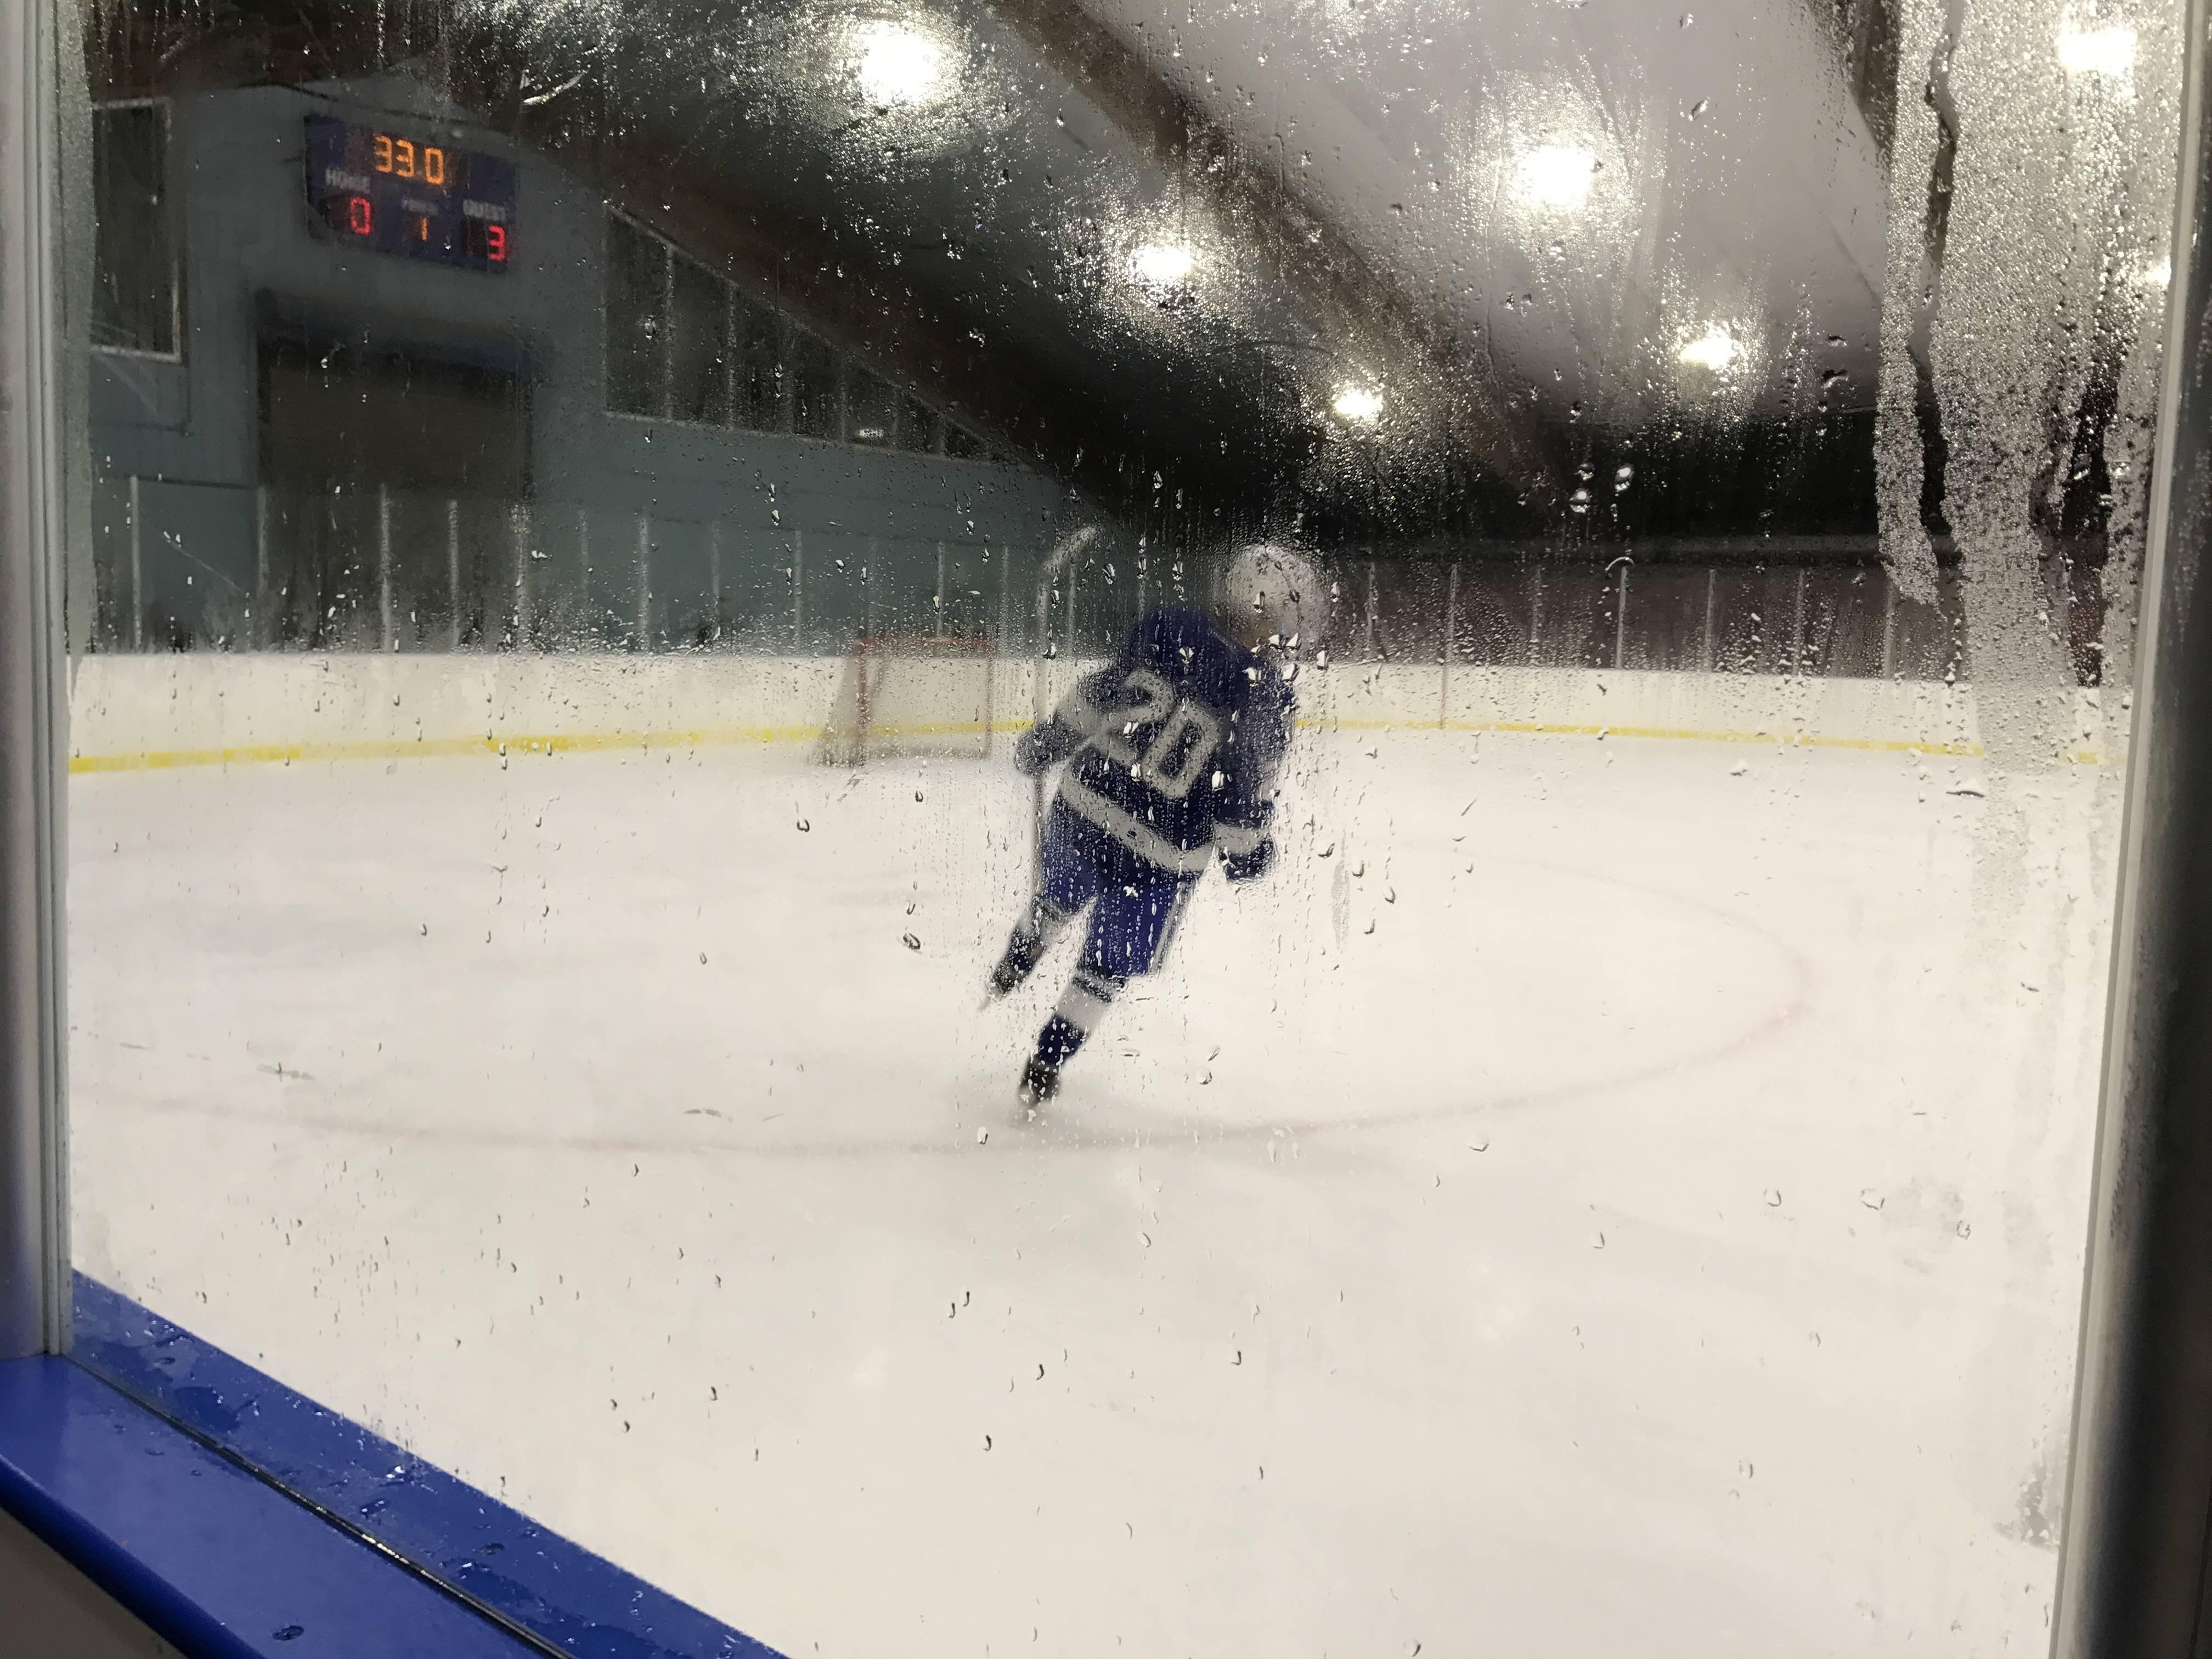 5709ce6d0bb8ad073dca_ALJ-Westfield_Ice_Hockey__1.JPG